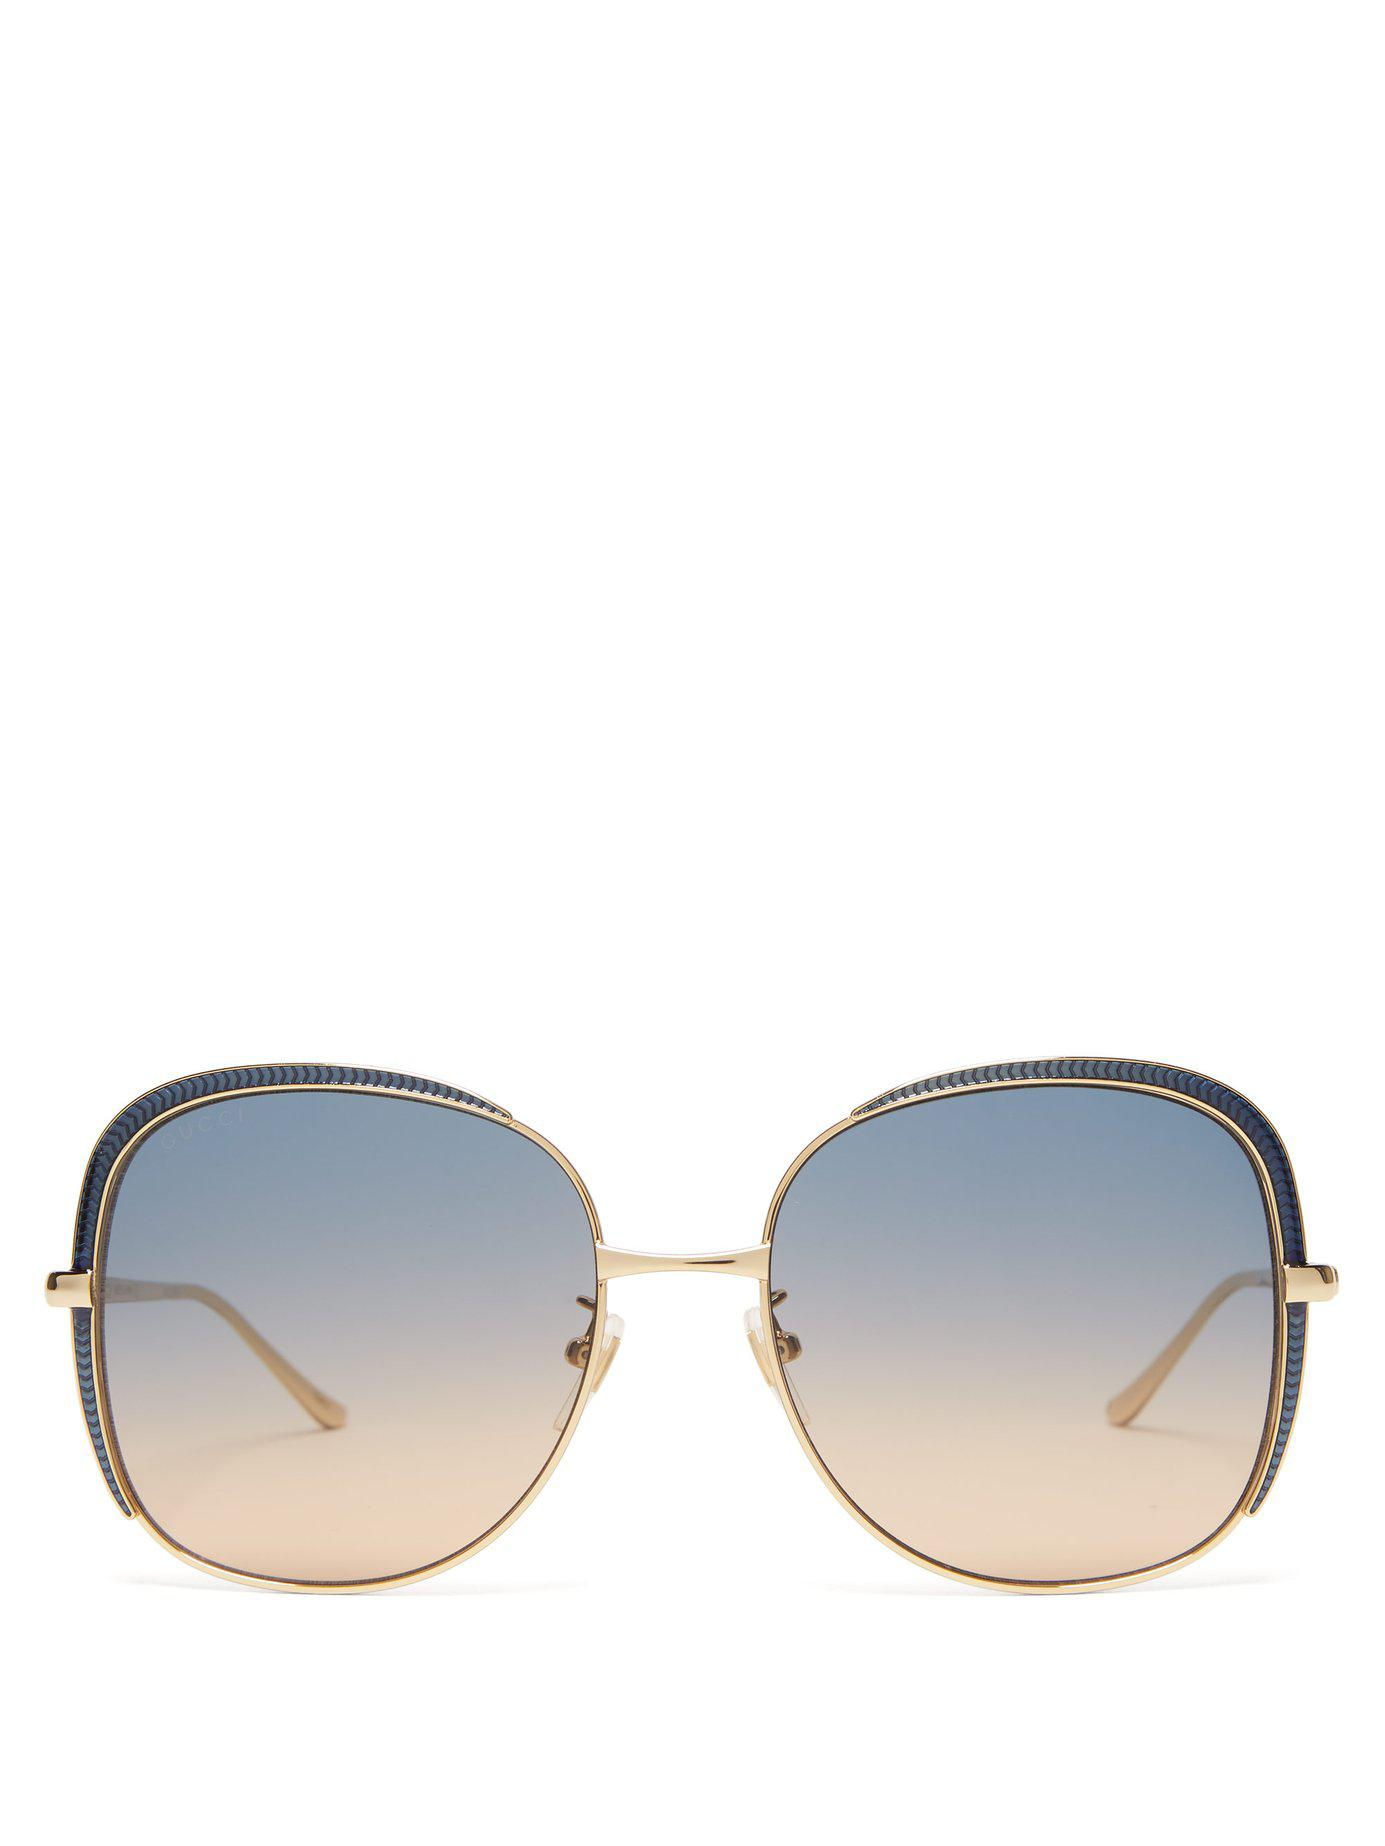 cf5699c8202 Gucci. Women s Oversized Square Frame Metal Sunglasses